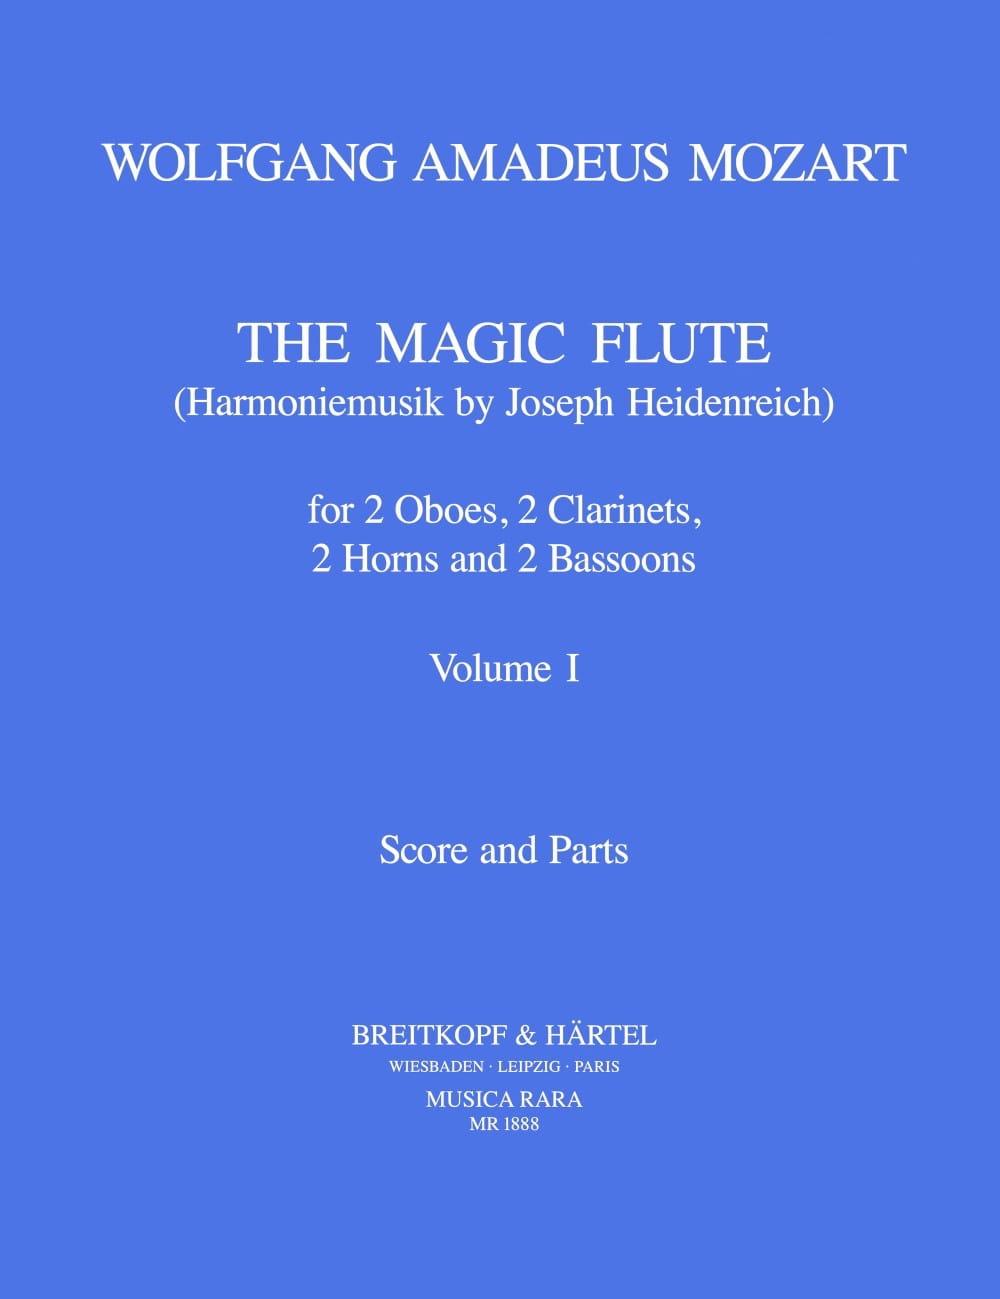 MOZART - The magic flute Volume 1 - Harmoniemusik - Score parts - Partition - di-arezzo.co.uk